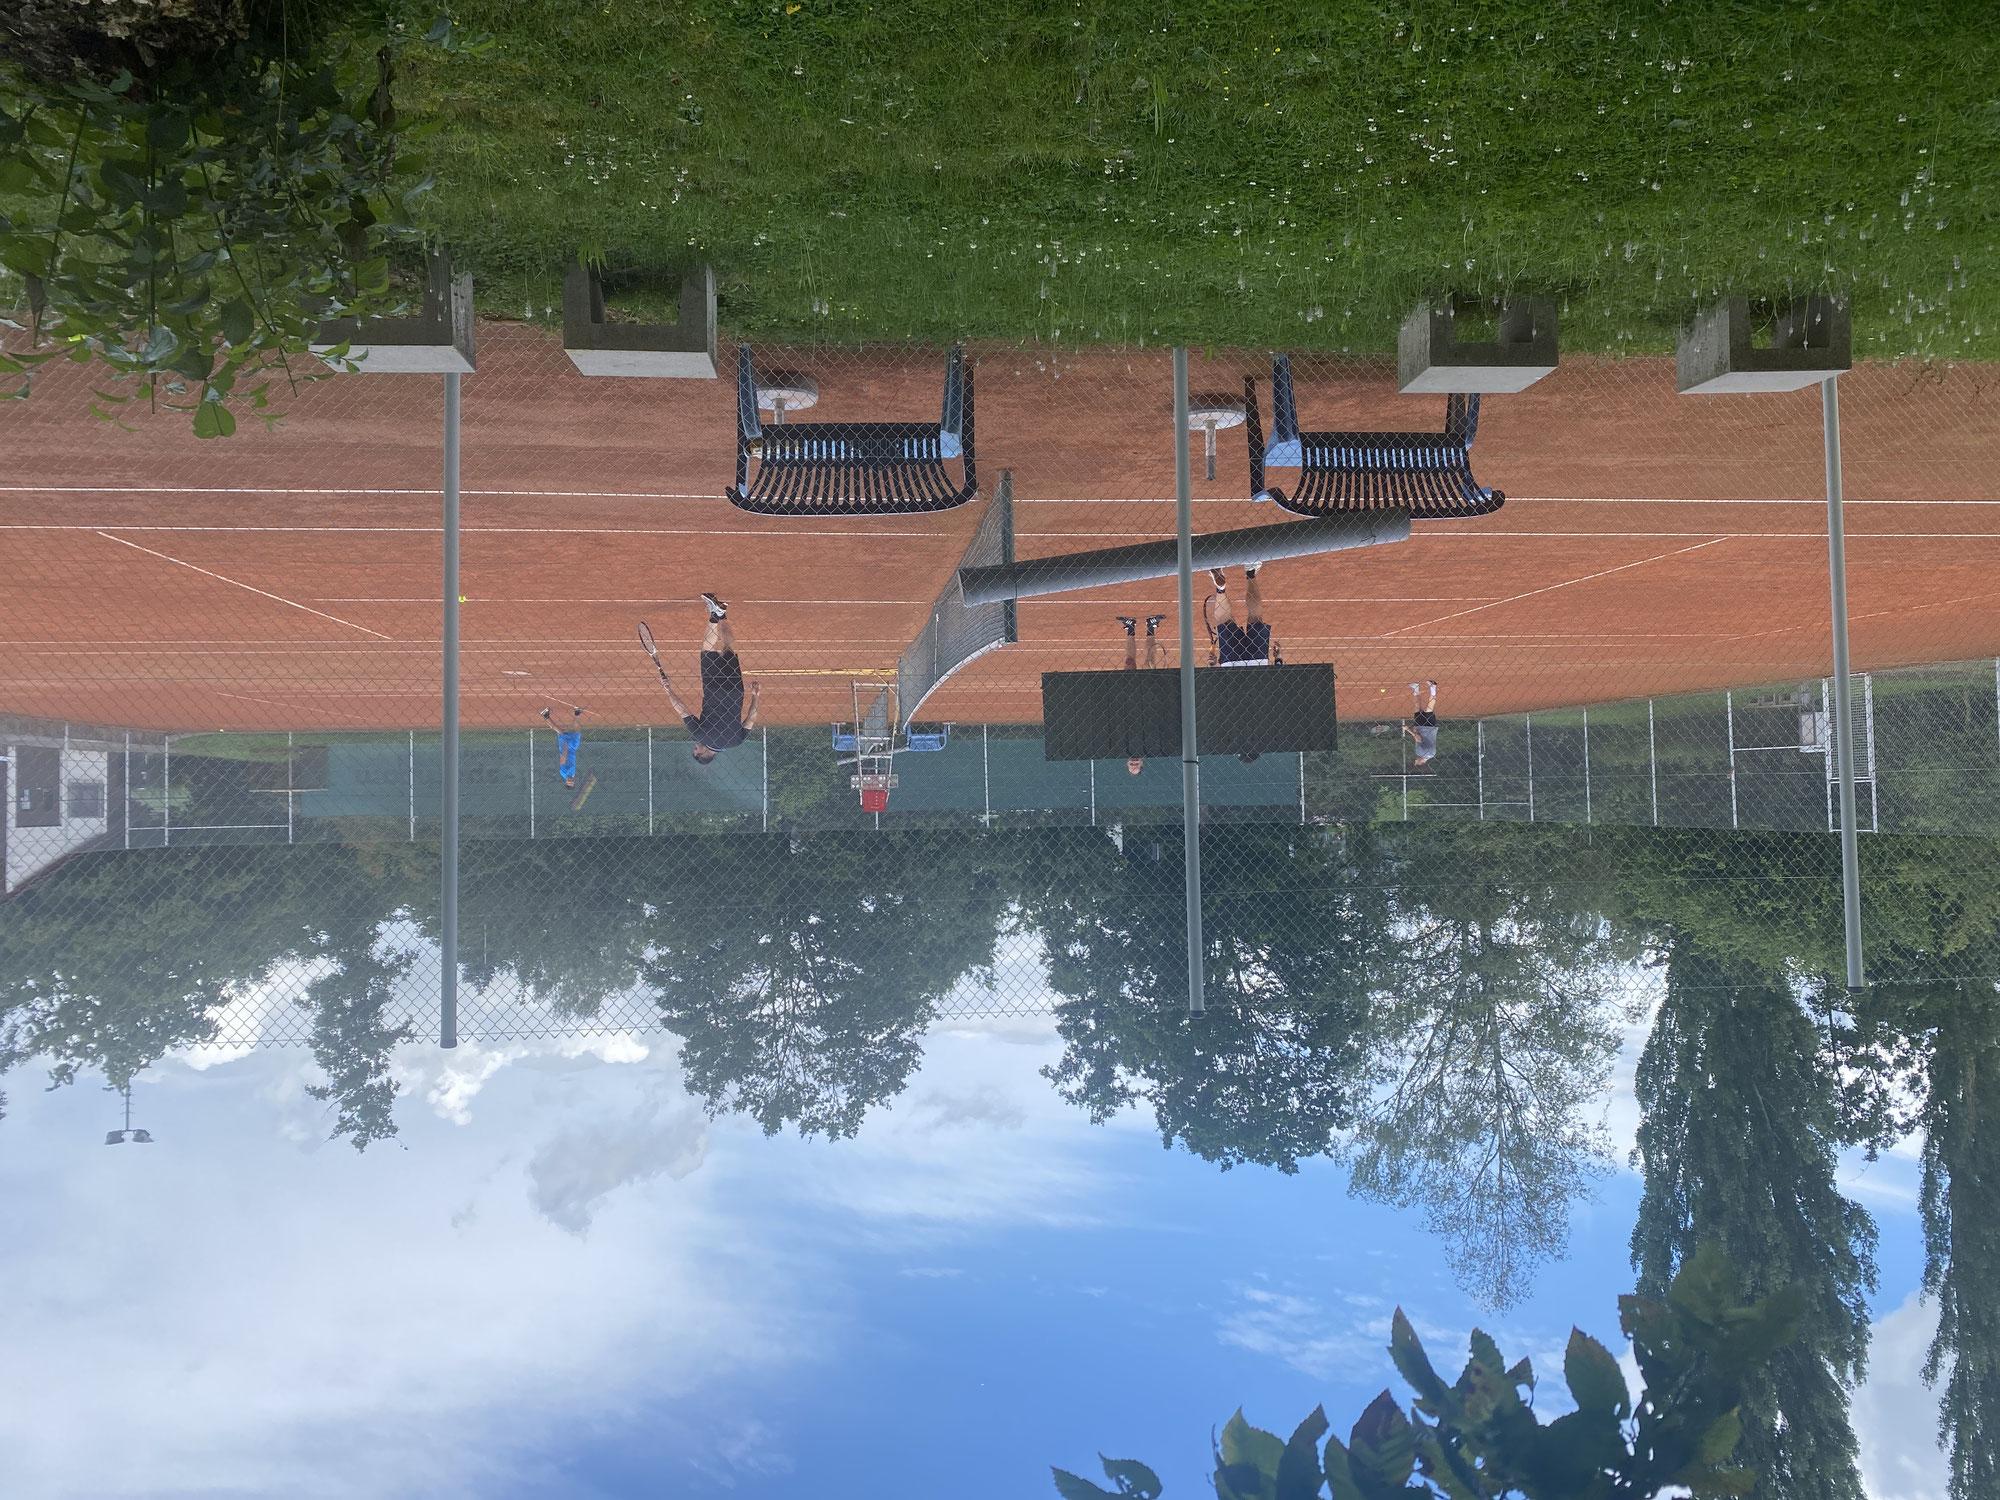 Abteilungsversammlung Tennis am 19.01.2022